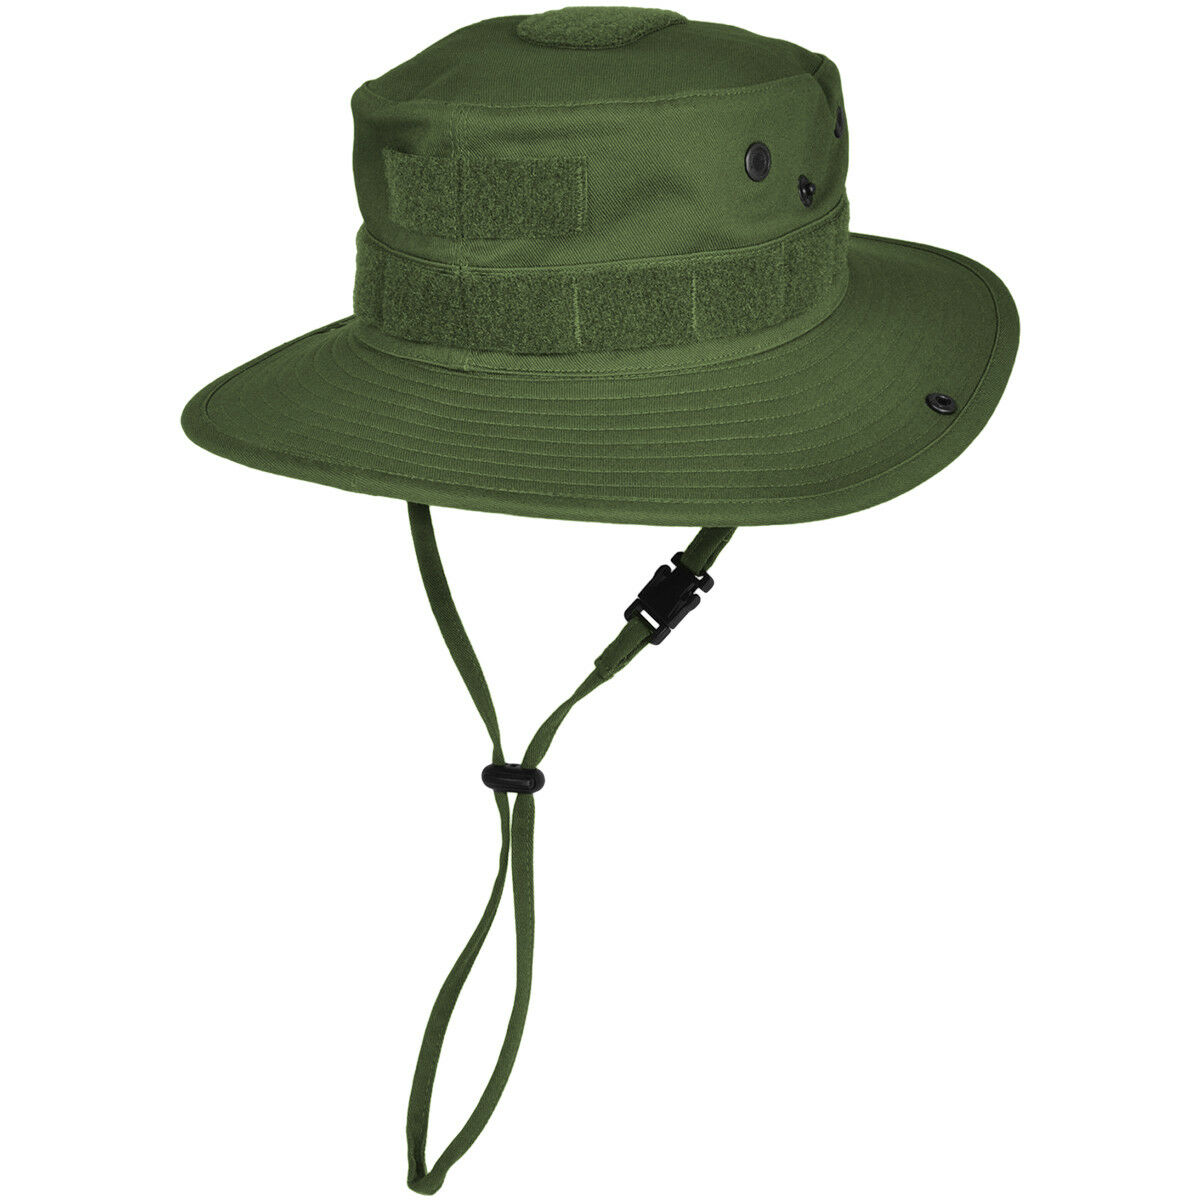 Hazard 4 SunTac Sun Hat Jungle Ripstop Military Army Mens Patrol Boonie OD Green